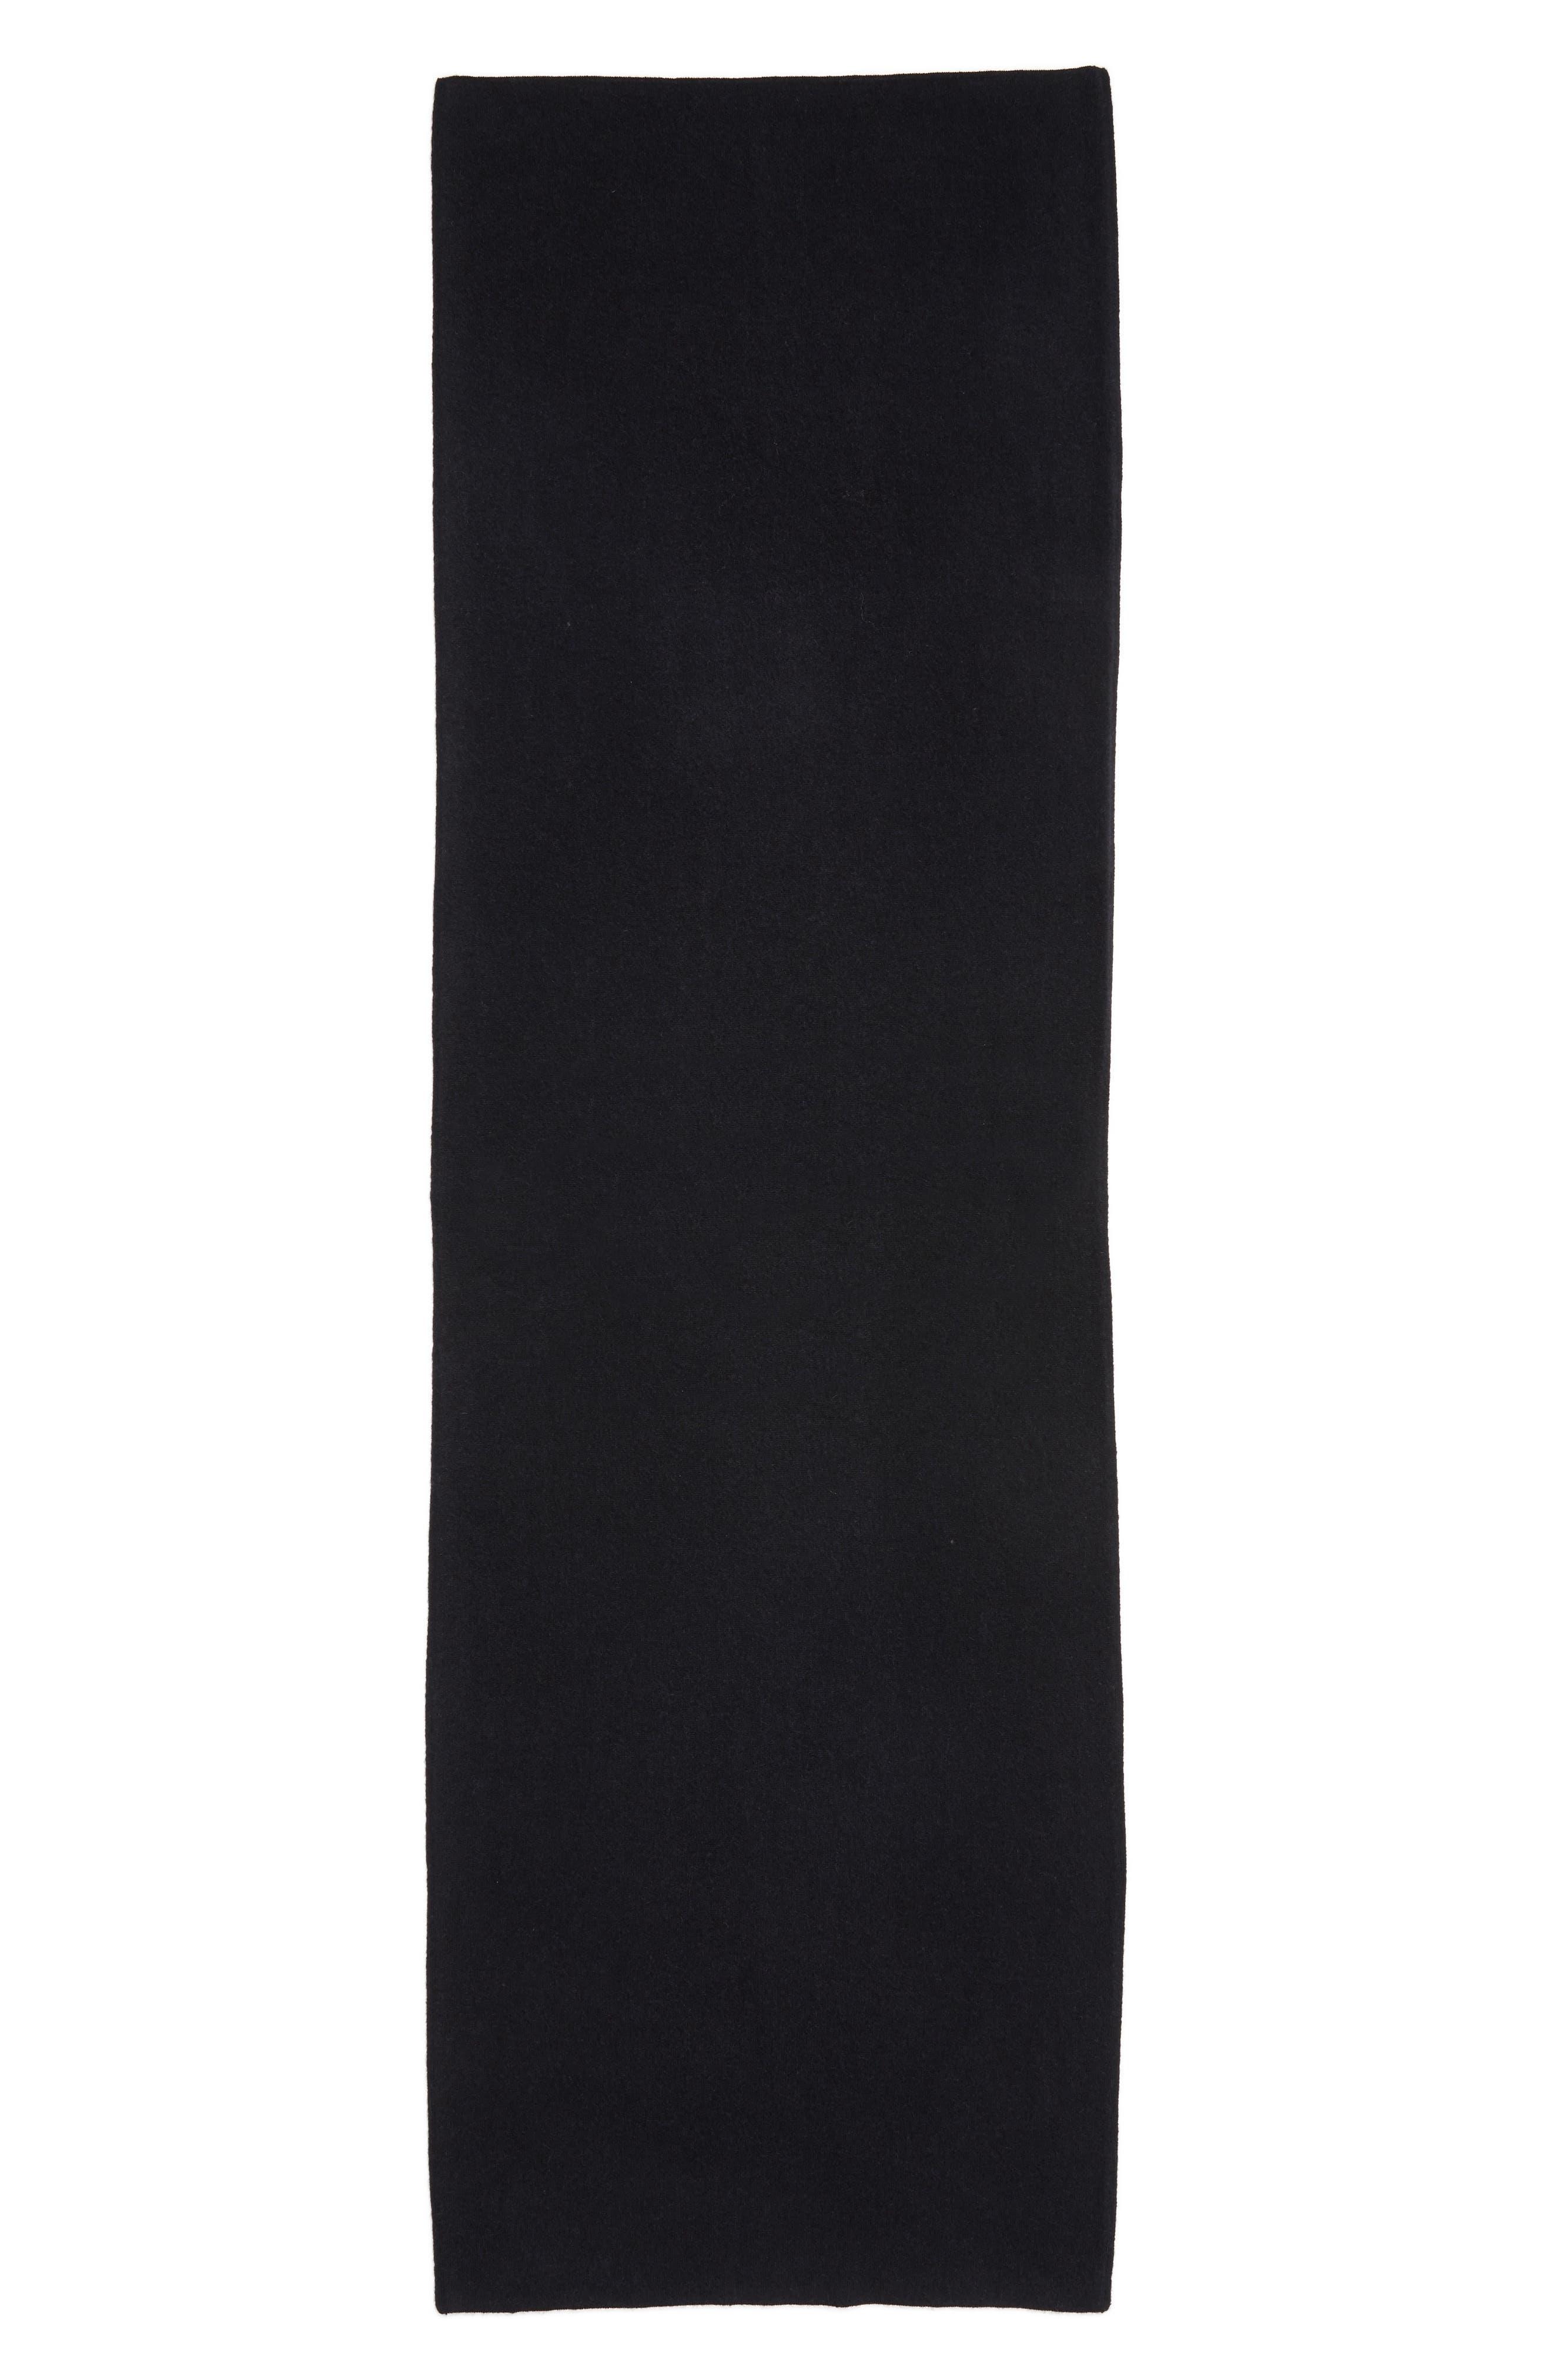 Cashmere Scarf,                             Alternate thumbnail 4, color,                             Black